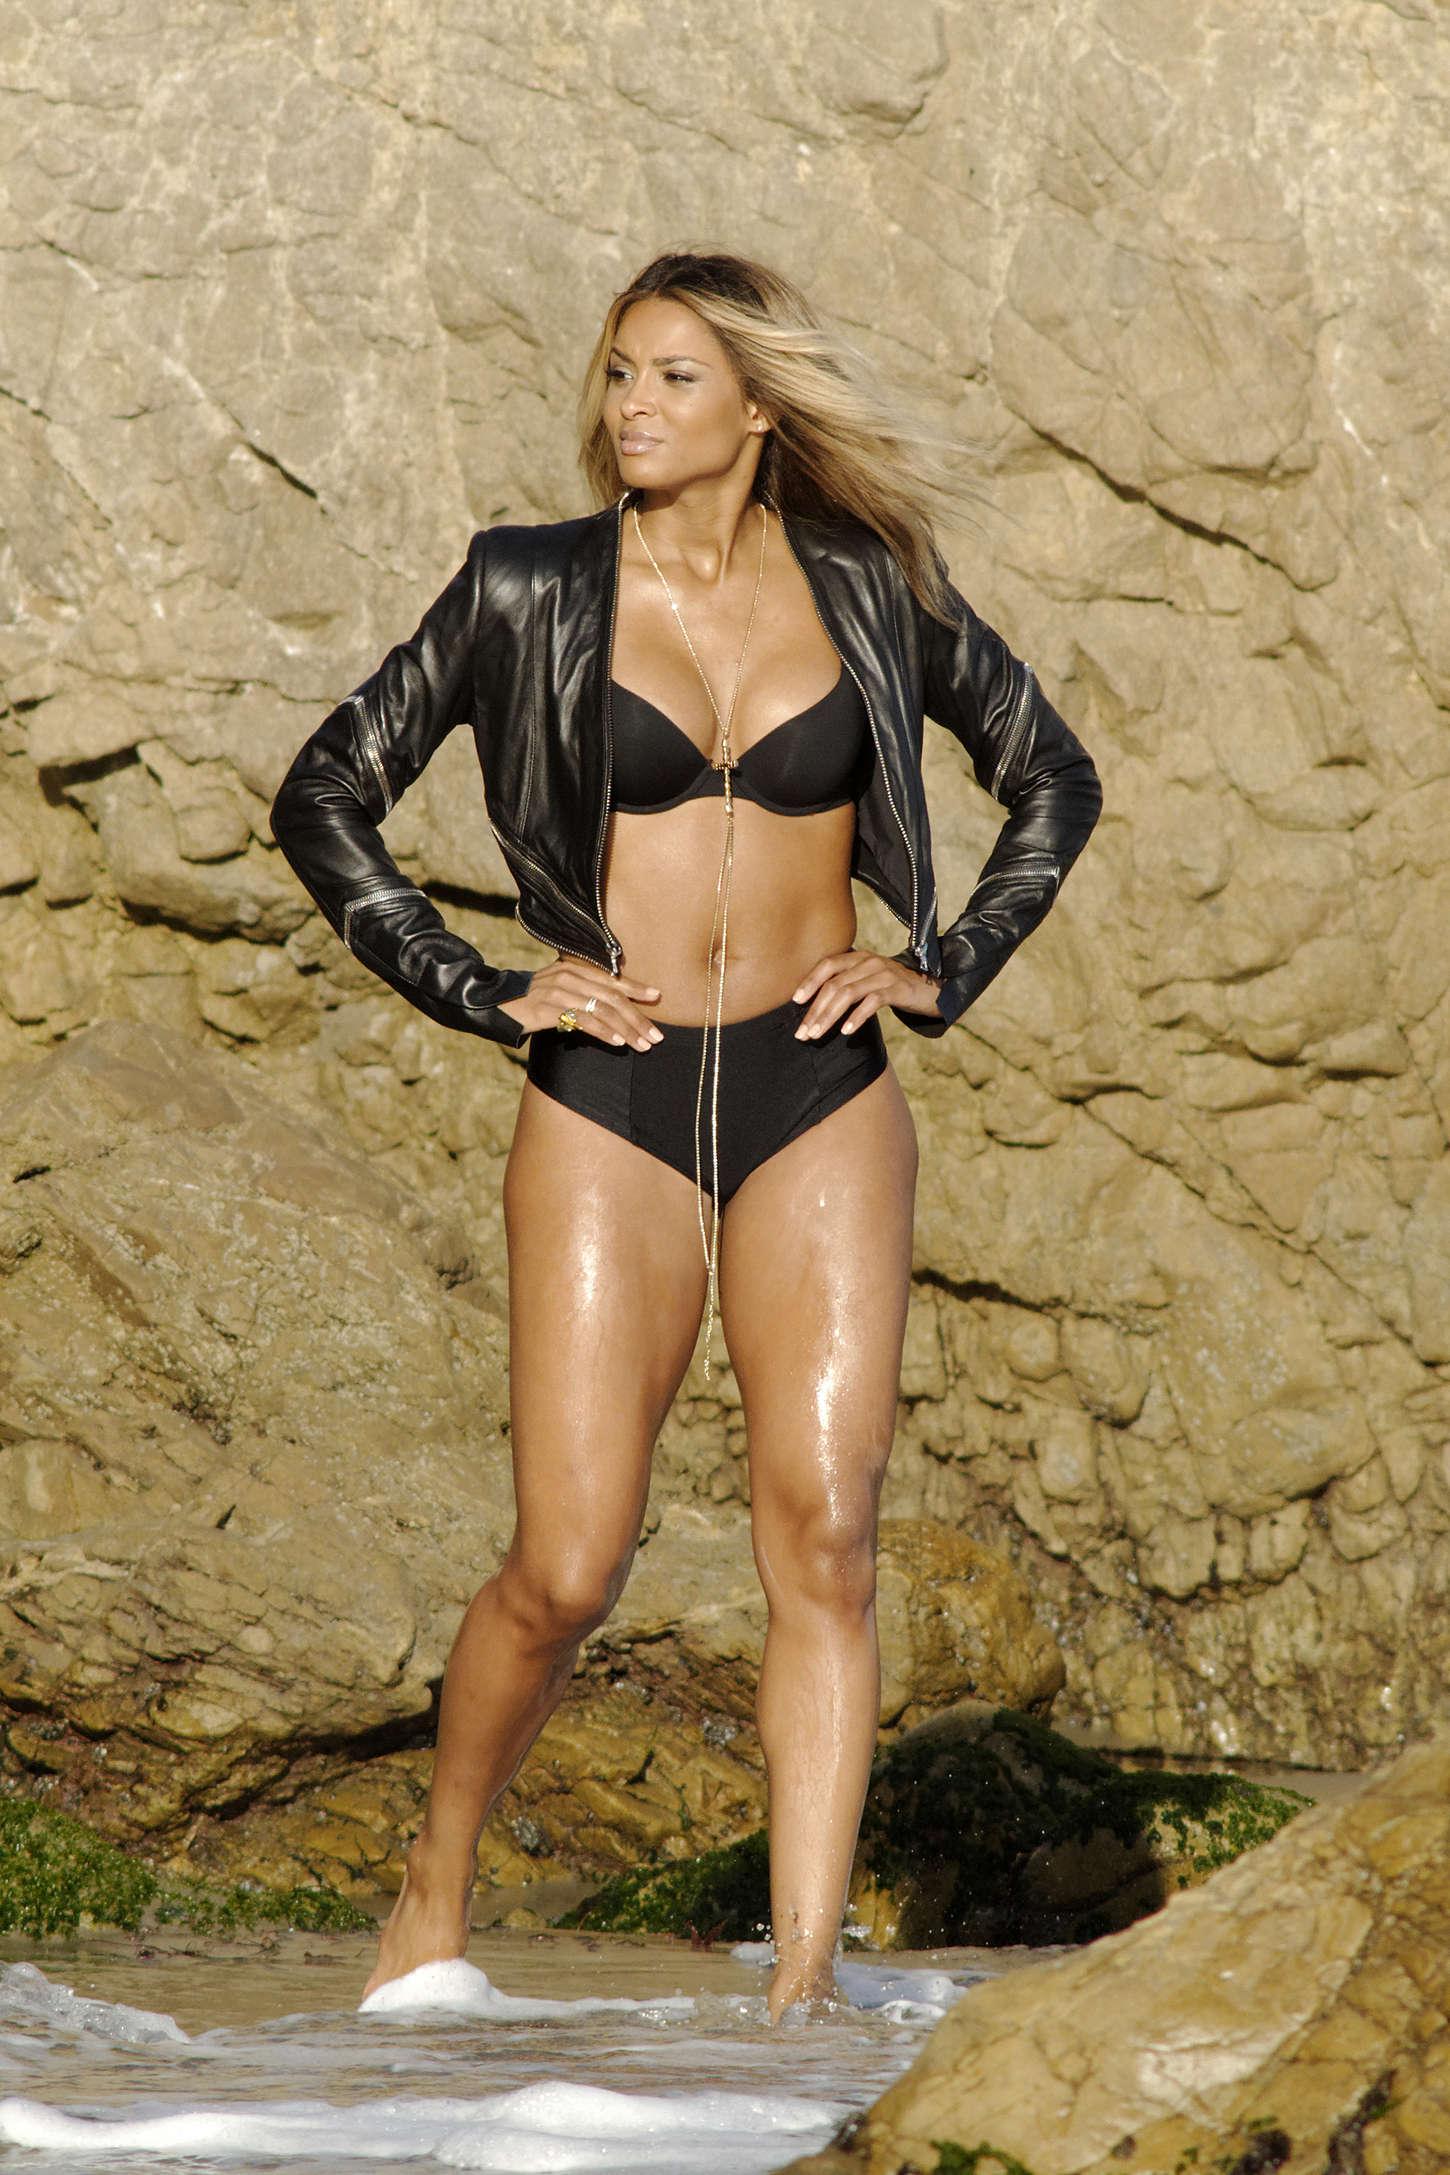 Ciara Hot Bikini Photos 08 Gotceleb